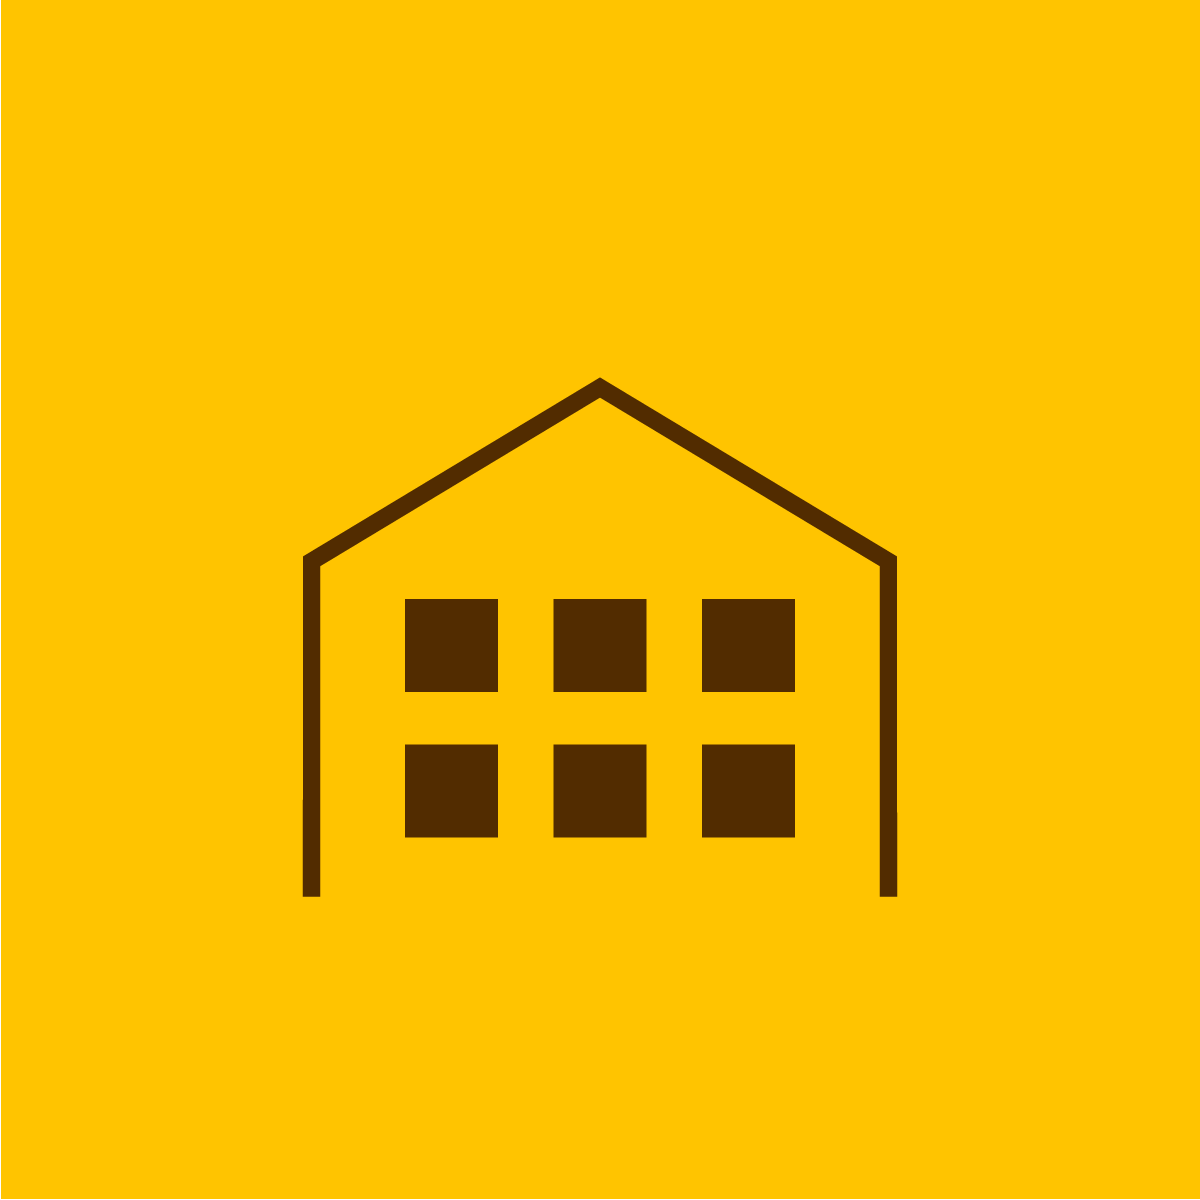 Mehrfamilienhaus-Icon der BRALE Bau GmbH